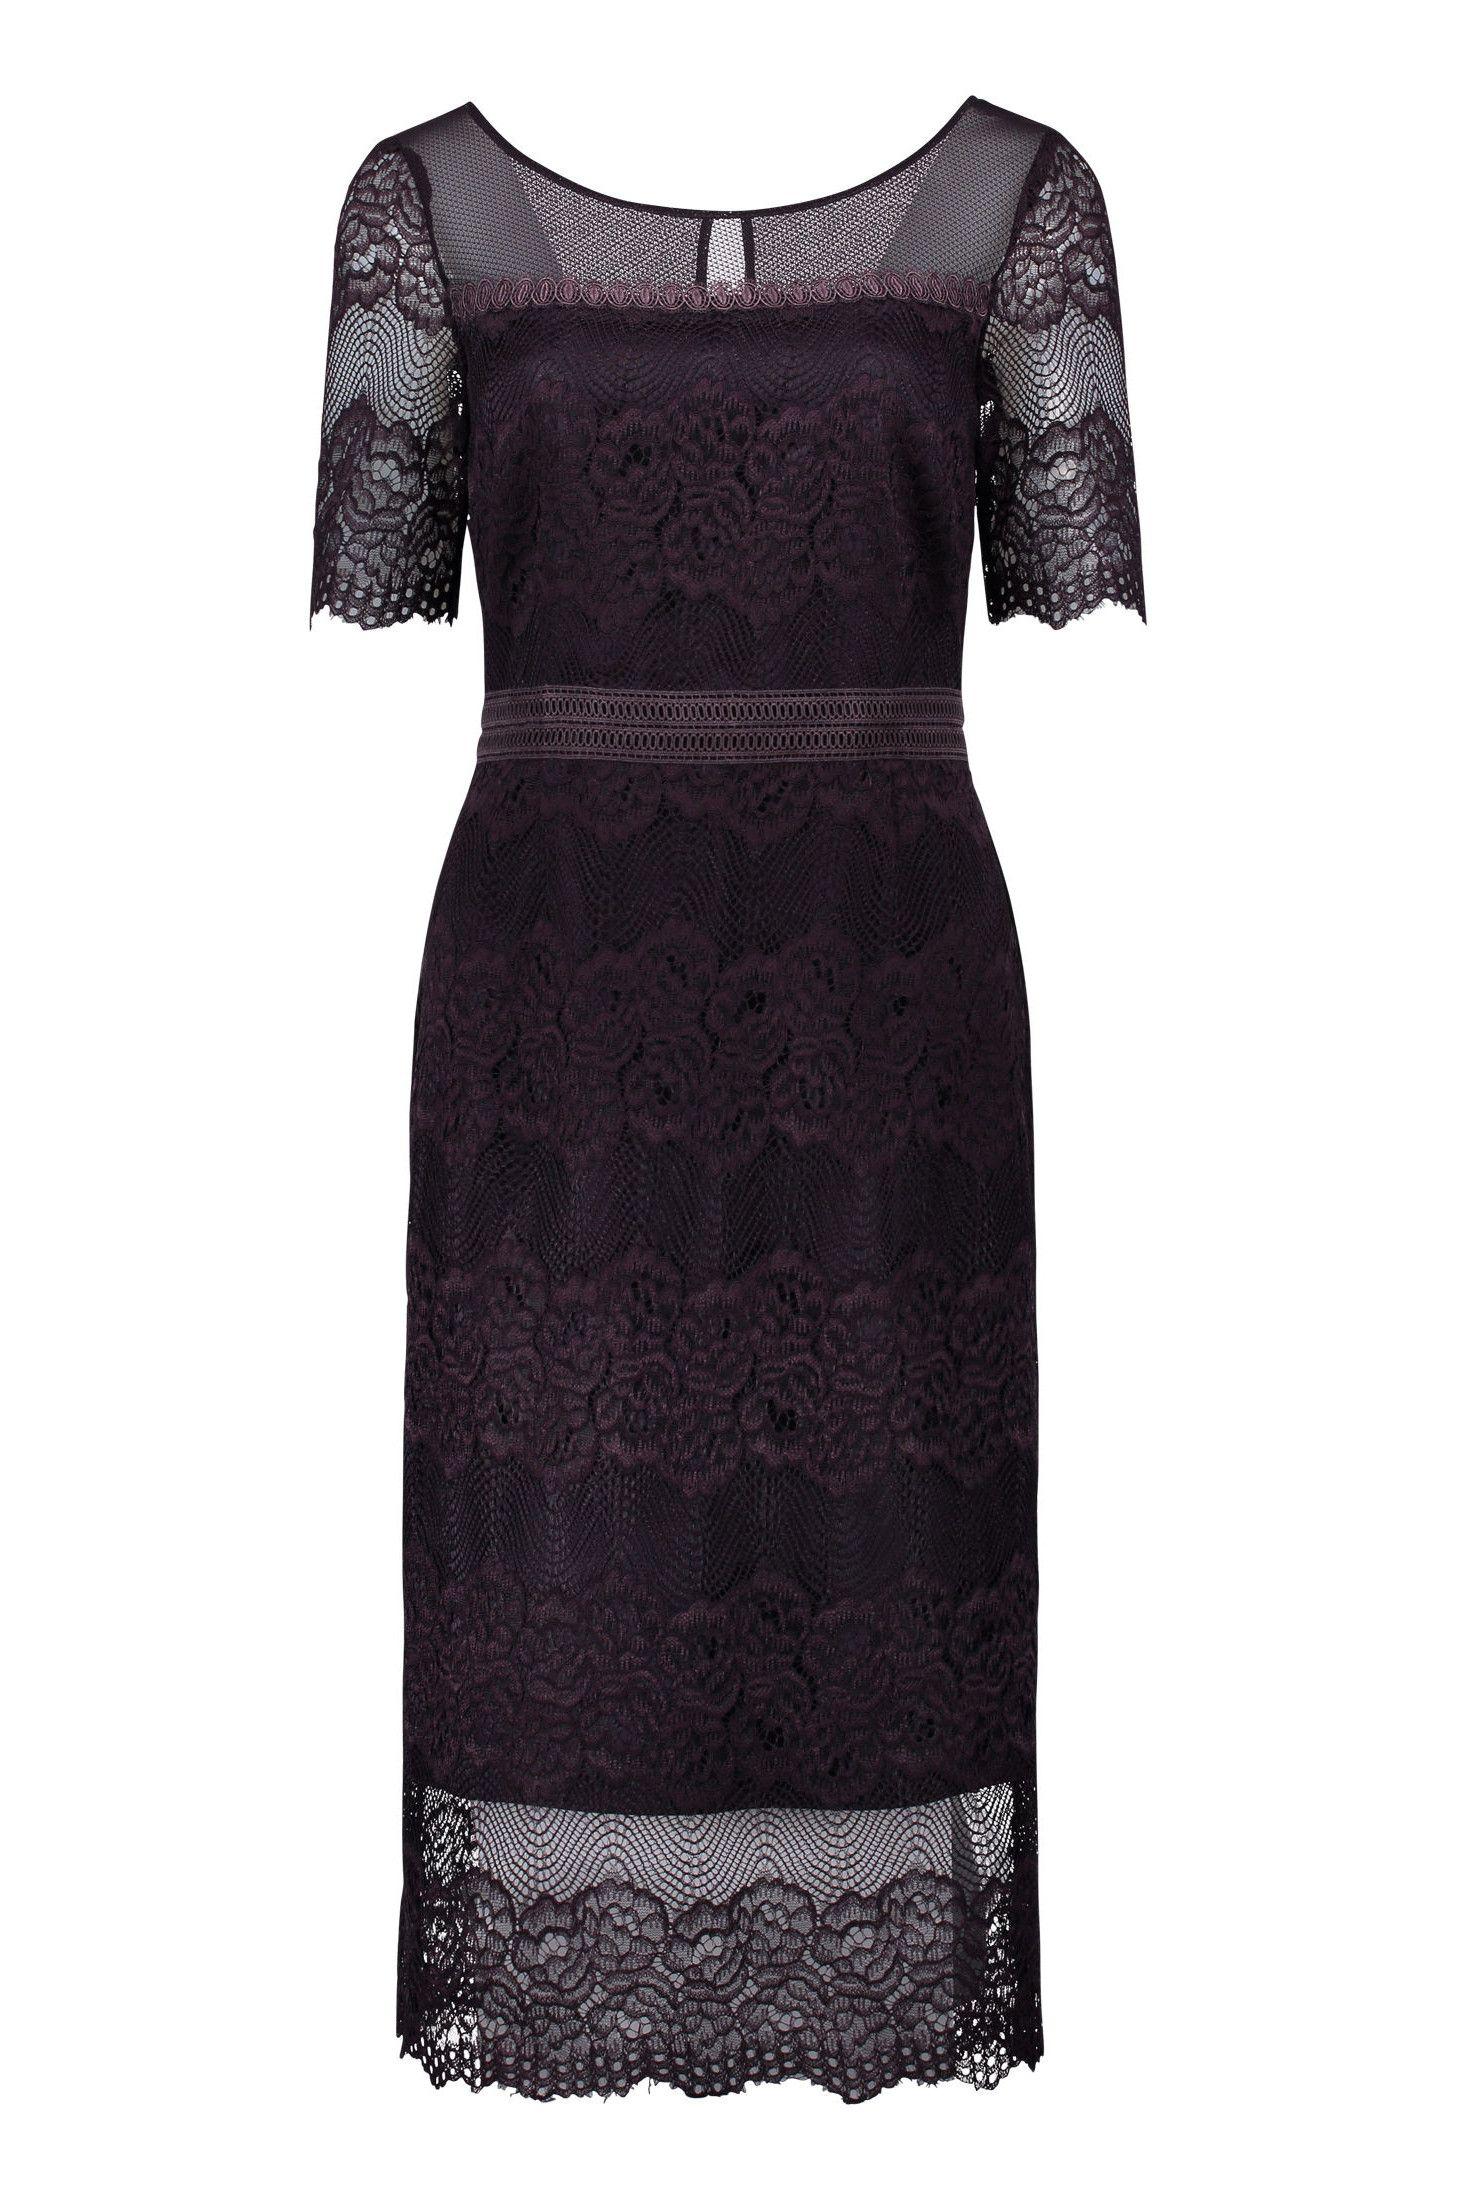 6f11e5e76372e4 Kleid mit Ärmel Häkelspitze Lila Vera Mont